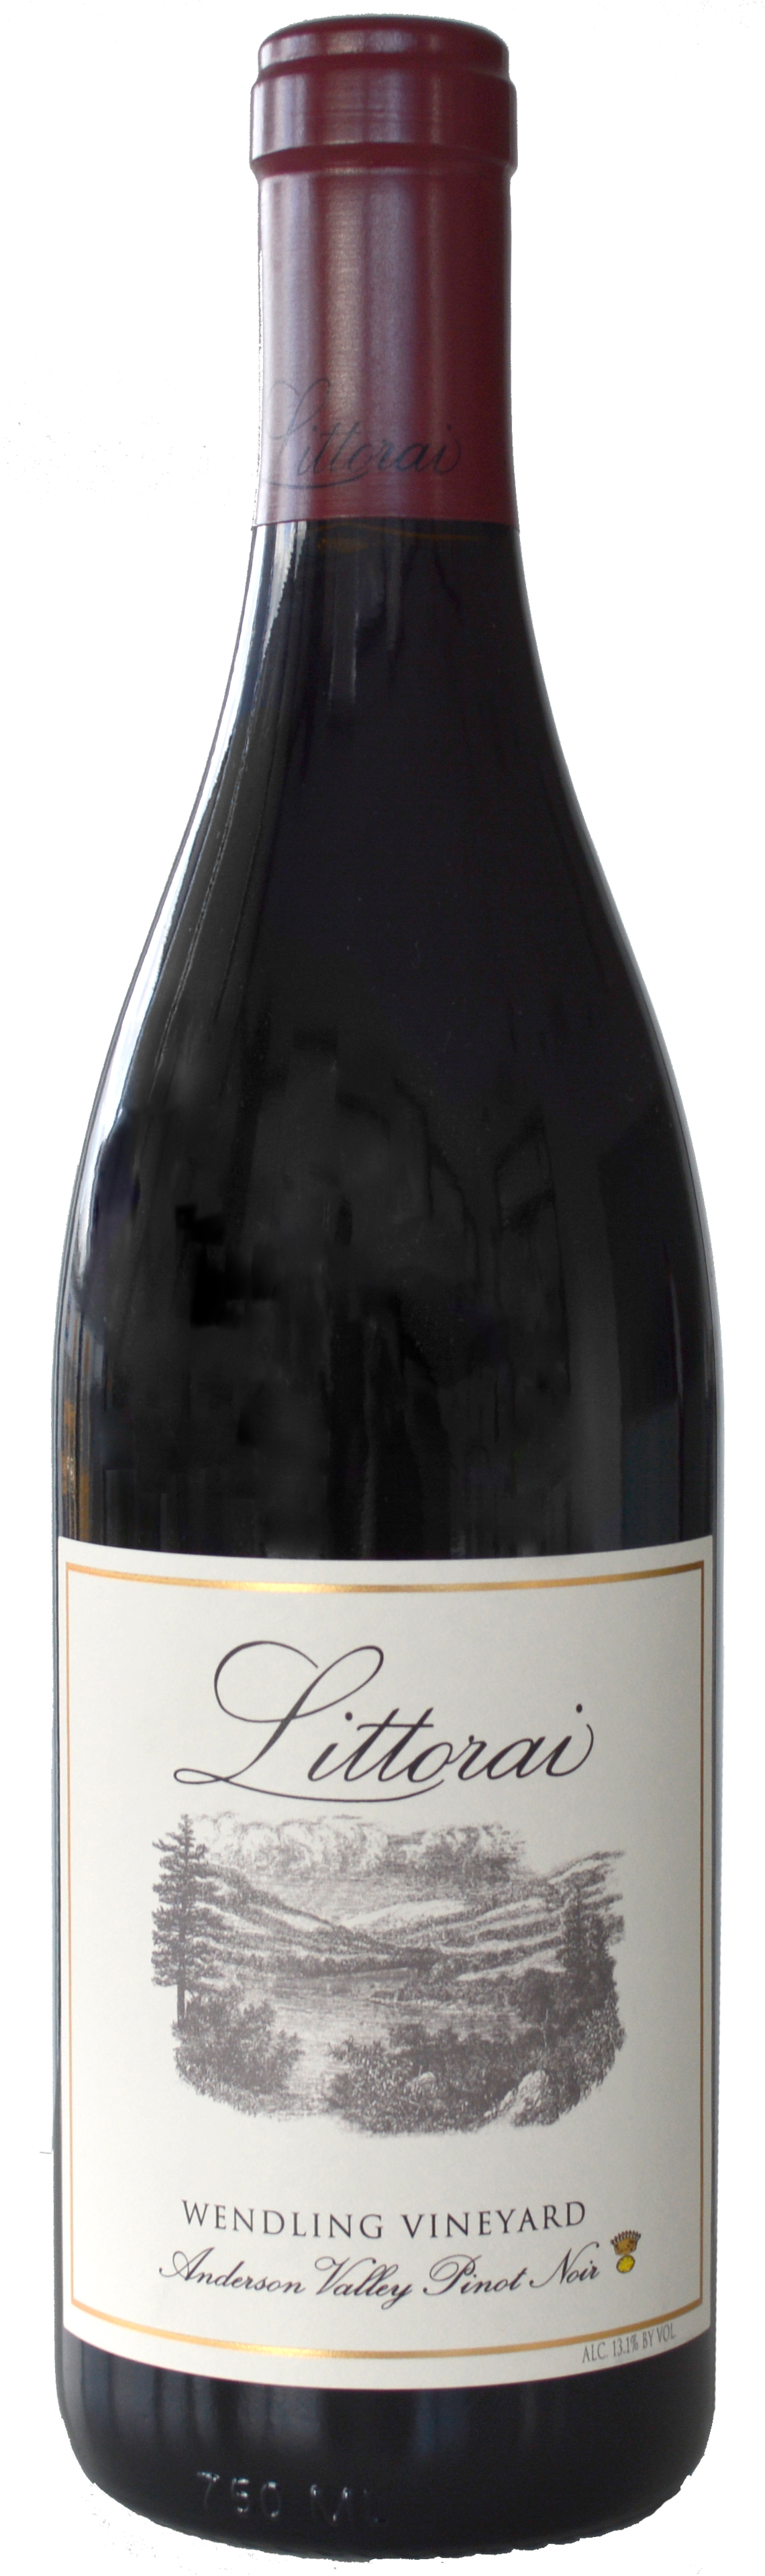 Littorai, `Wendling Vineyard` Anderson Valley Pinot Noir 2015